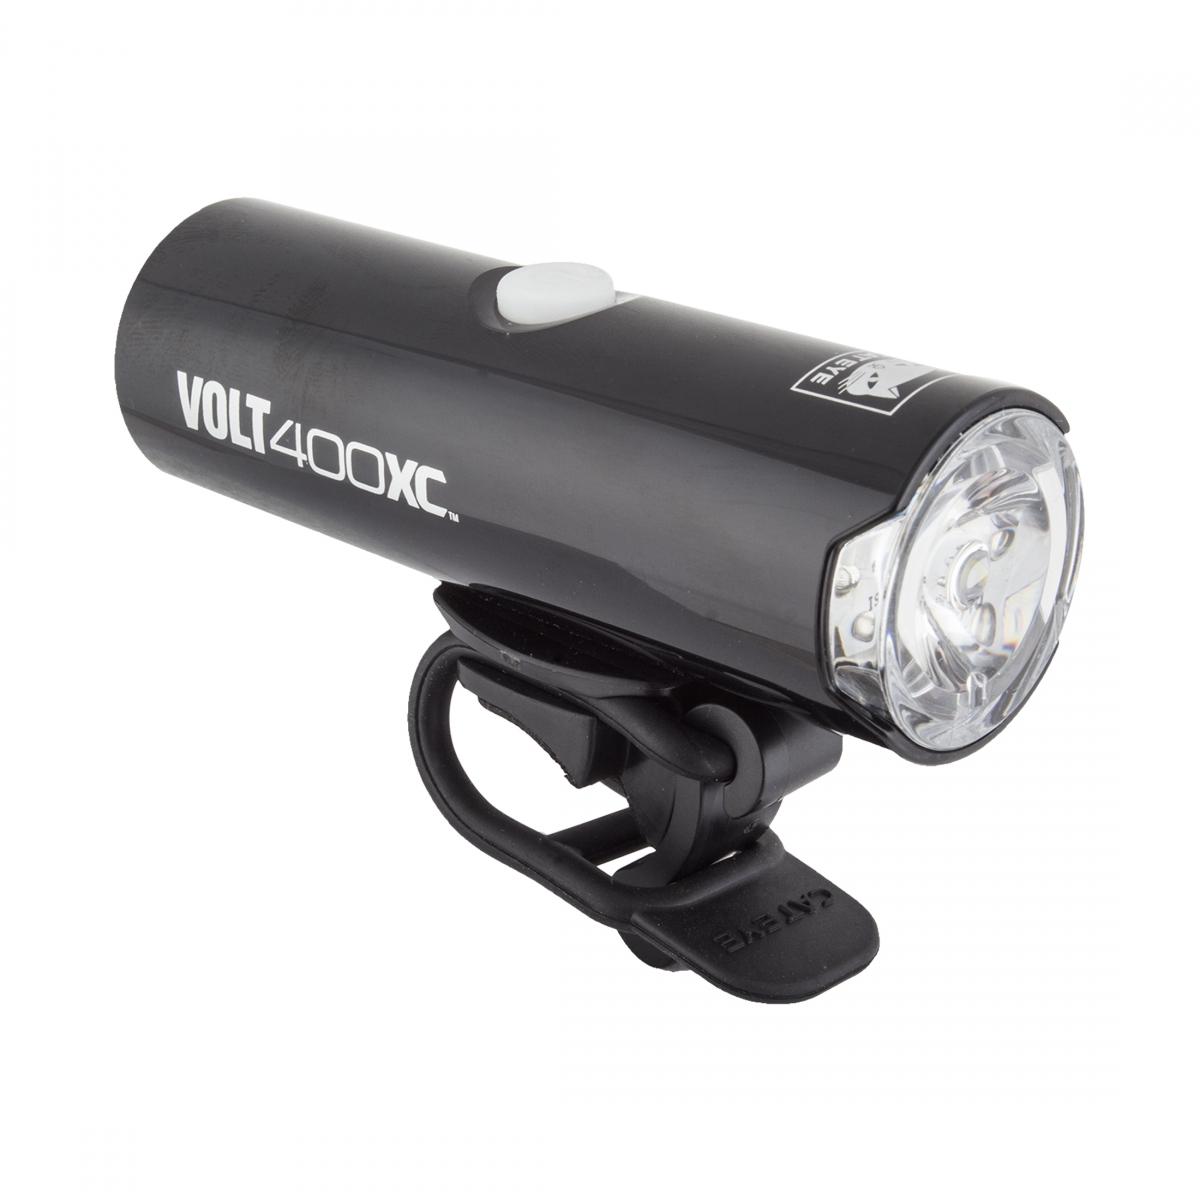 2F//4R Black Cateye Combo Volt100Xc//Rapid Micro Hl-El051Rc//Tl-Ld620R Lights